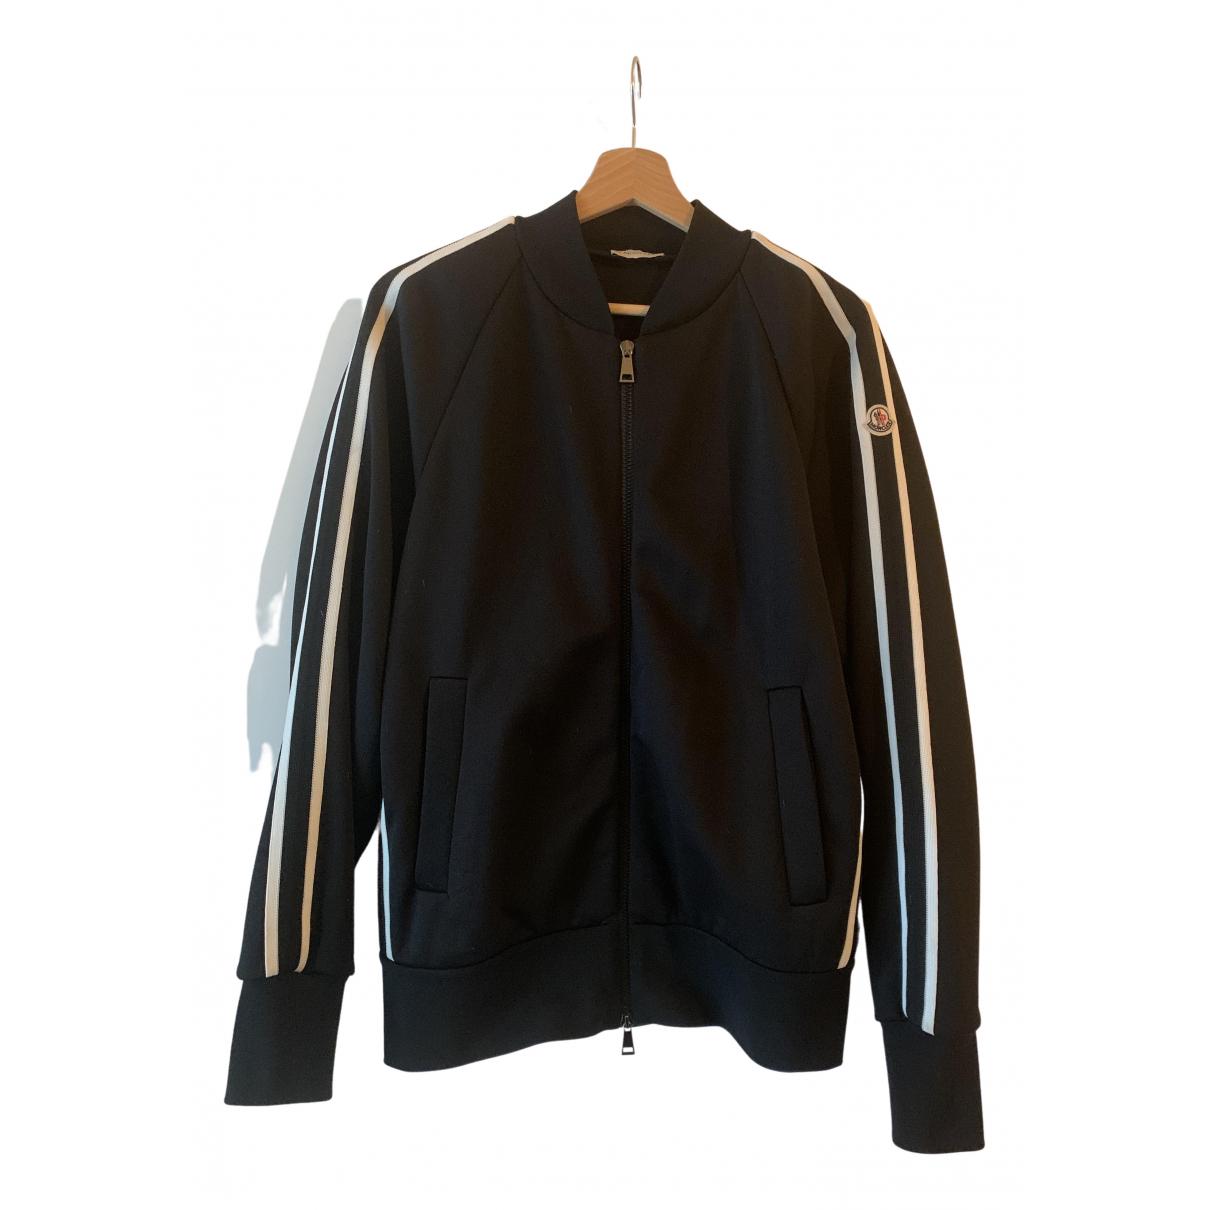 Moncler \N Black Leather jacket for Women S International